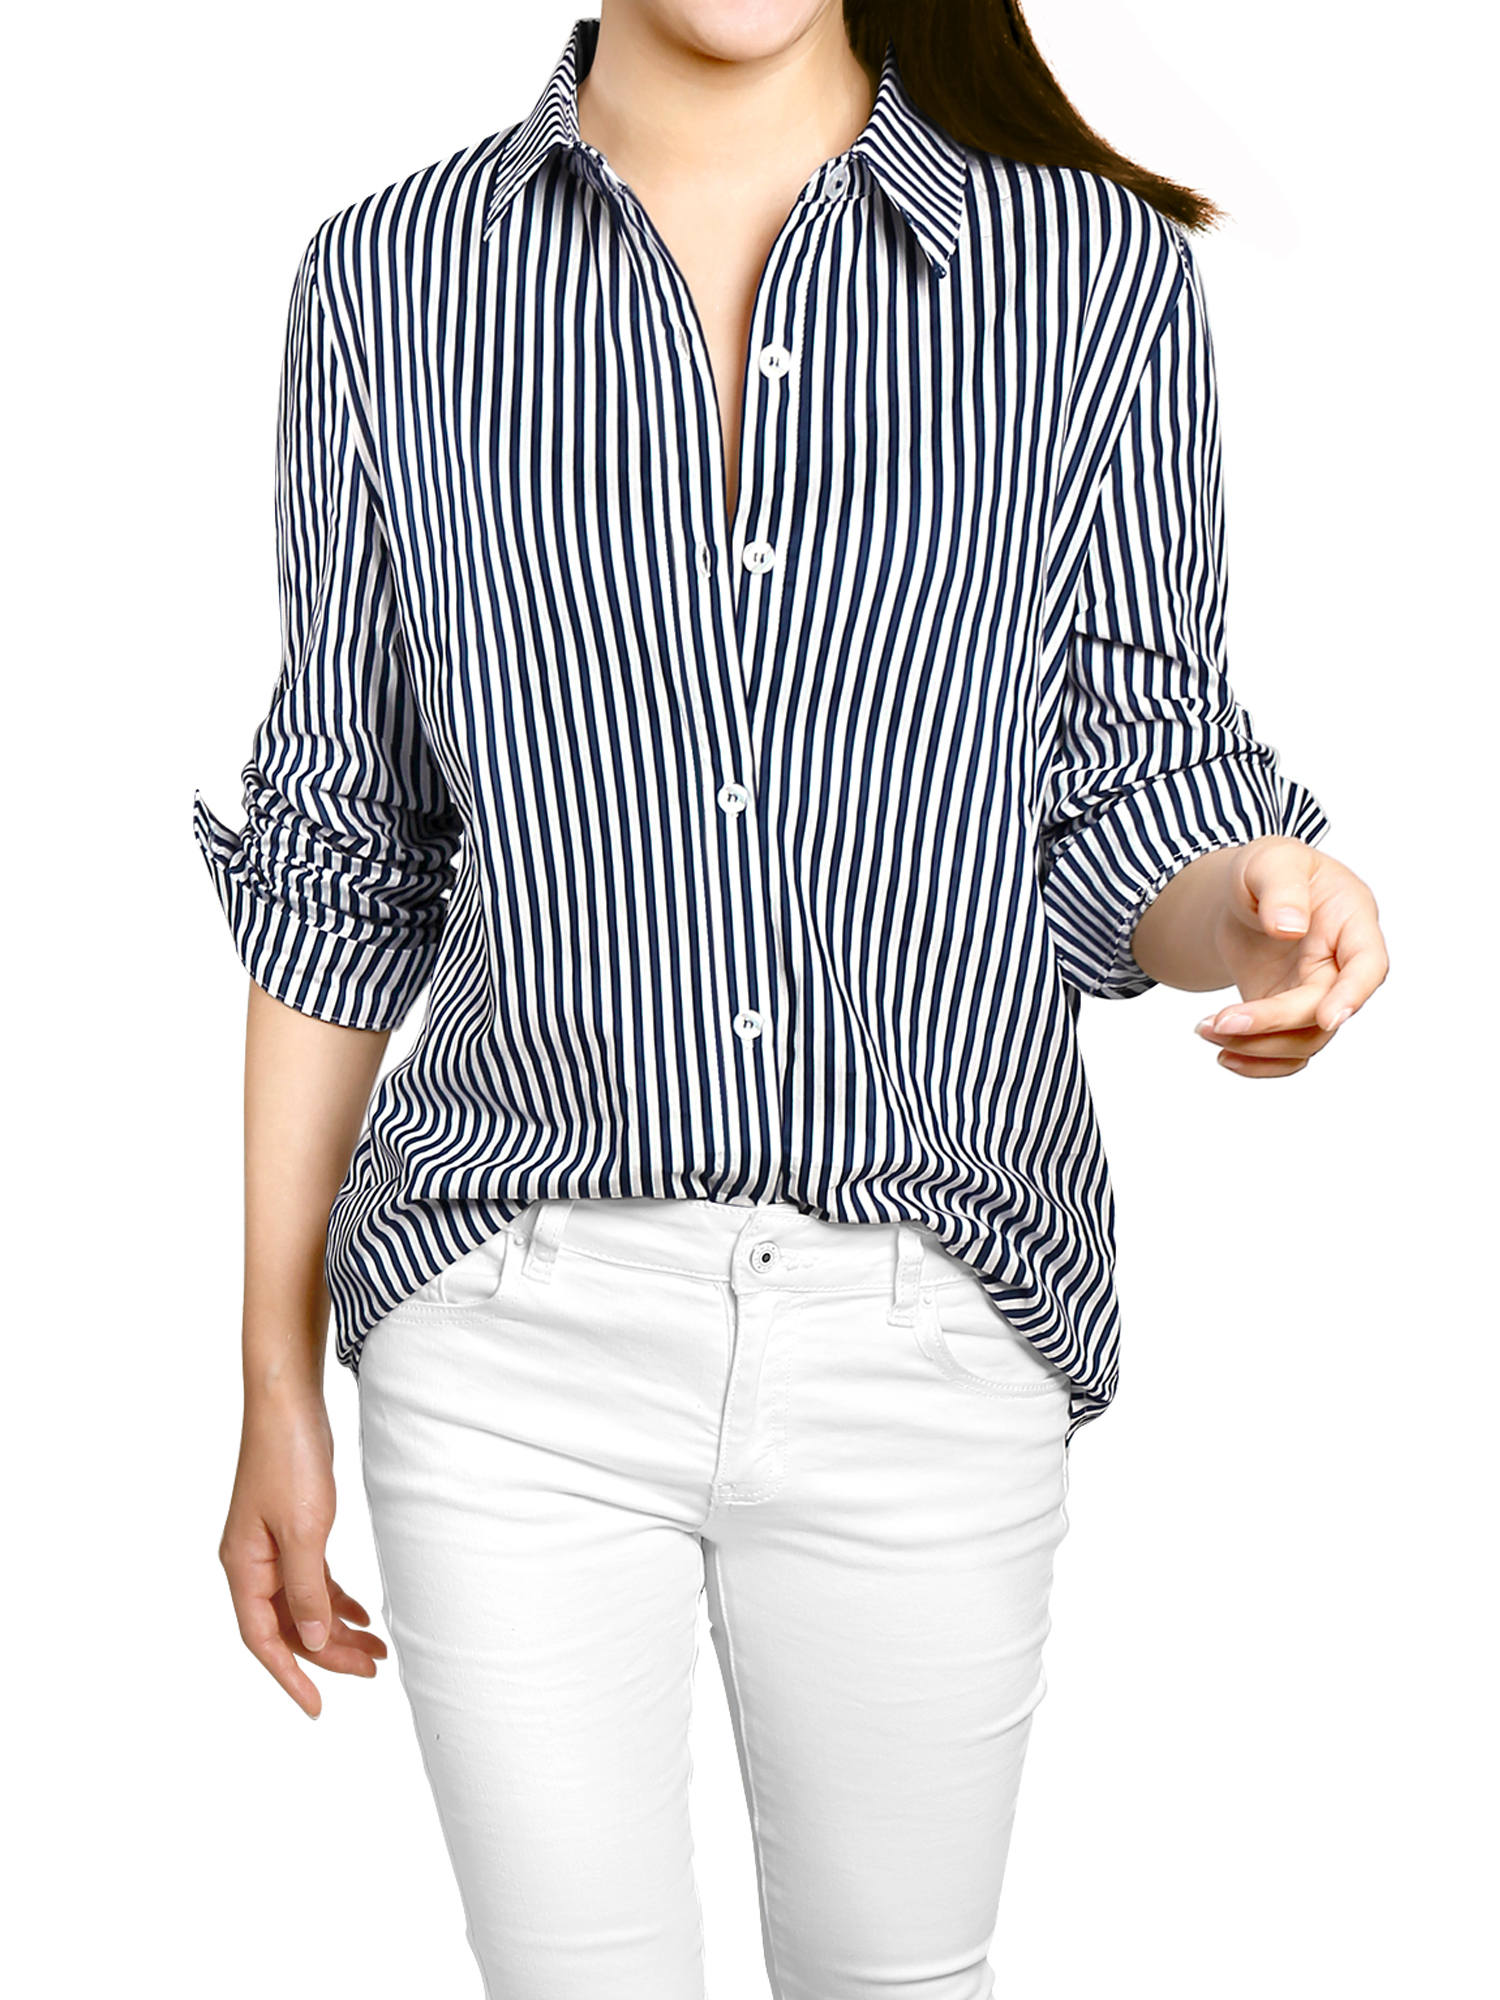 Allegra K Women Striped High Low Hem Roll Up Sleeves Shirt Dark Blue White M